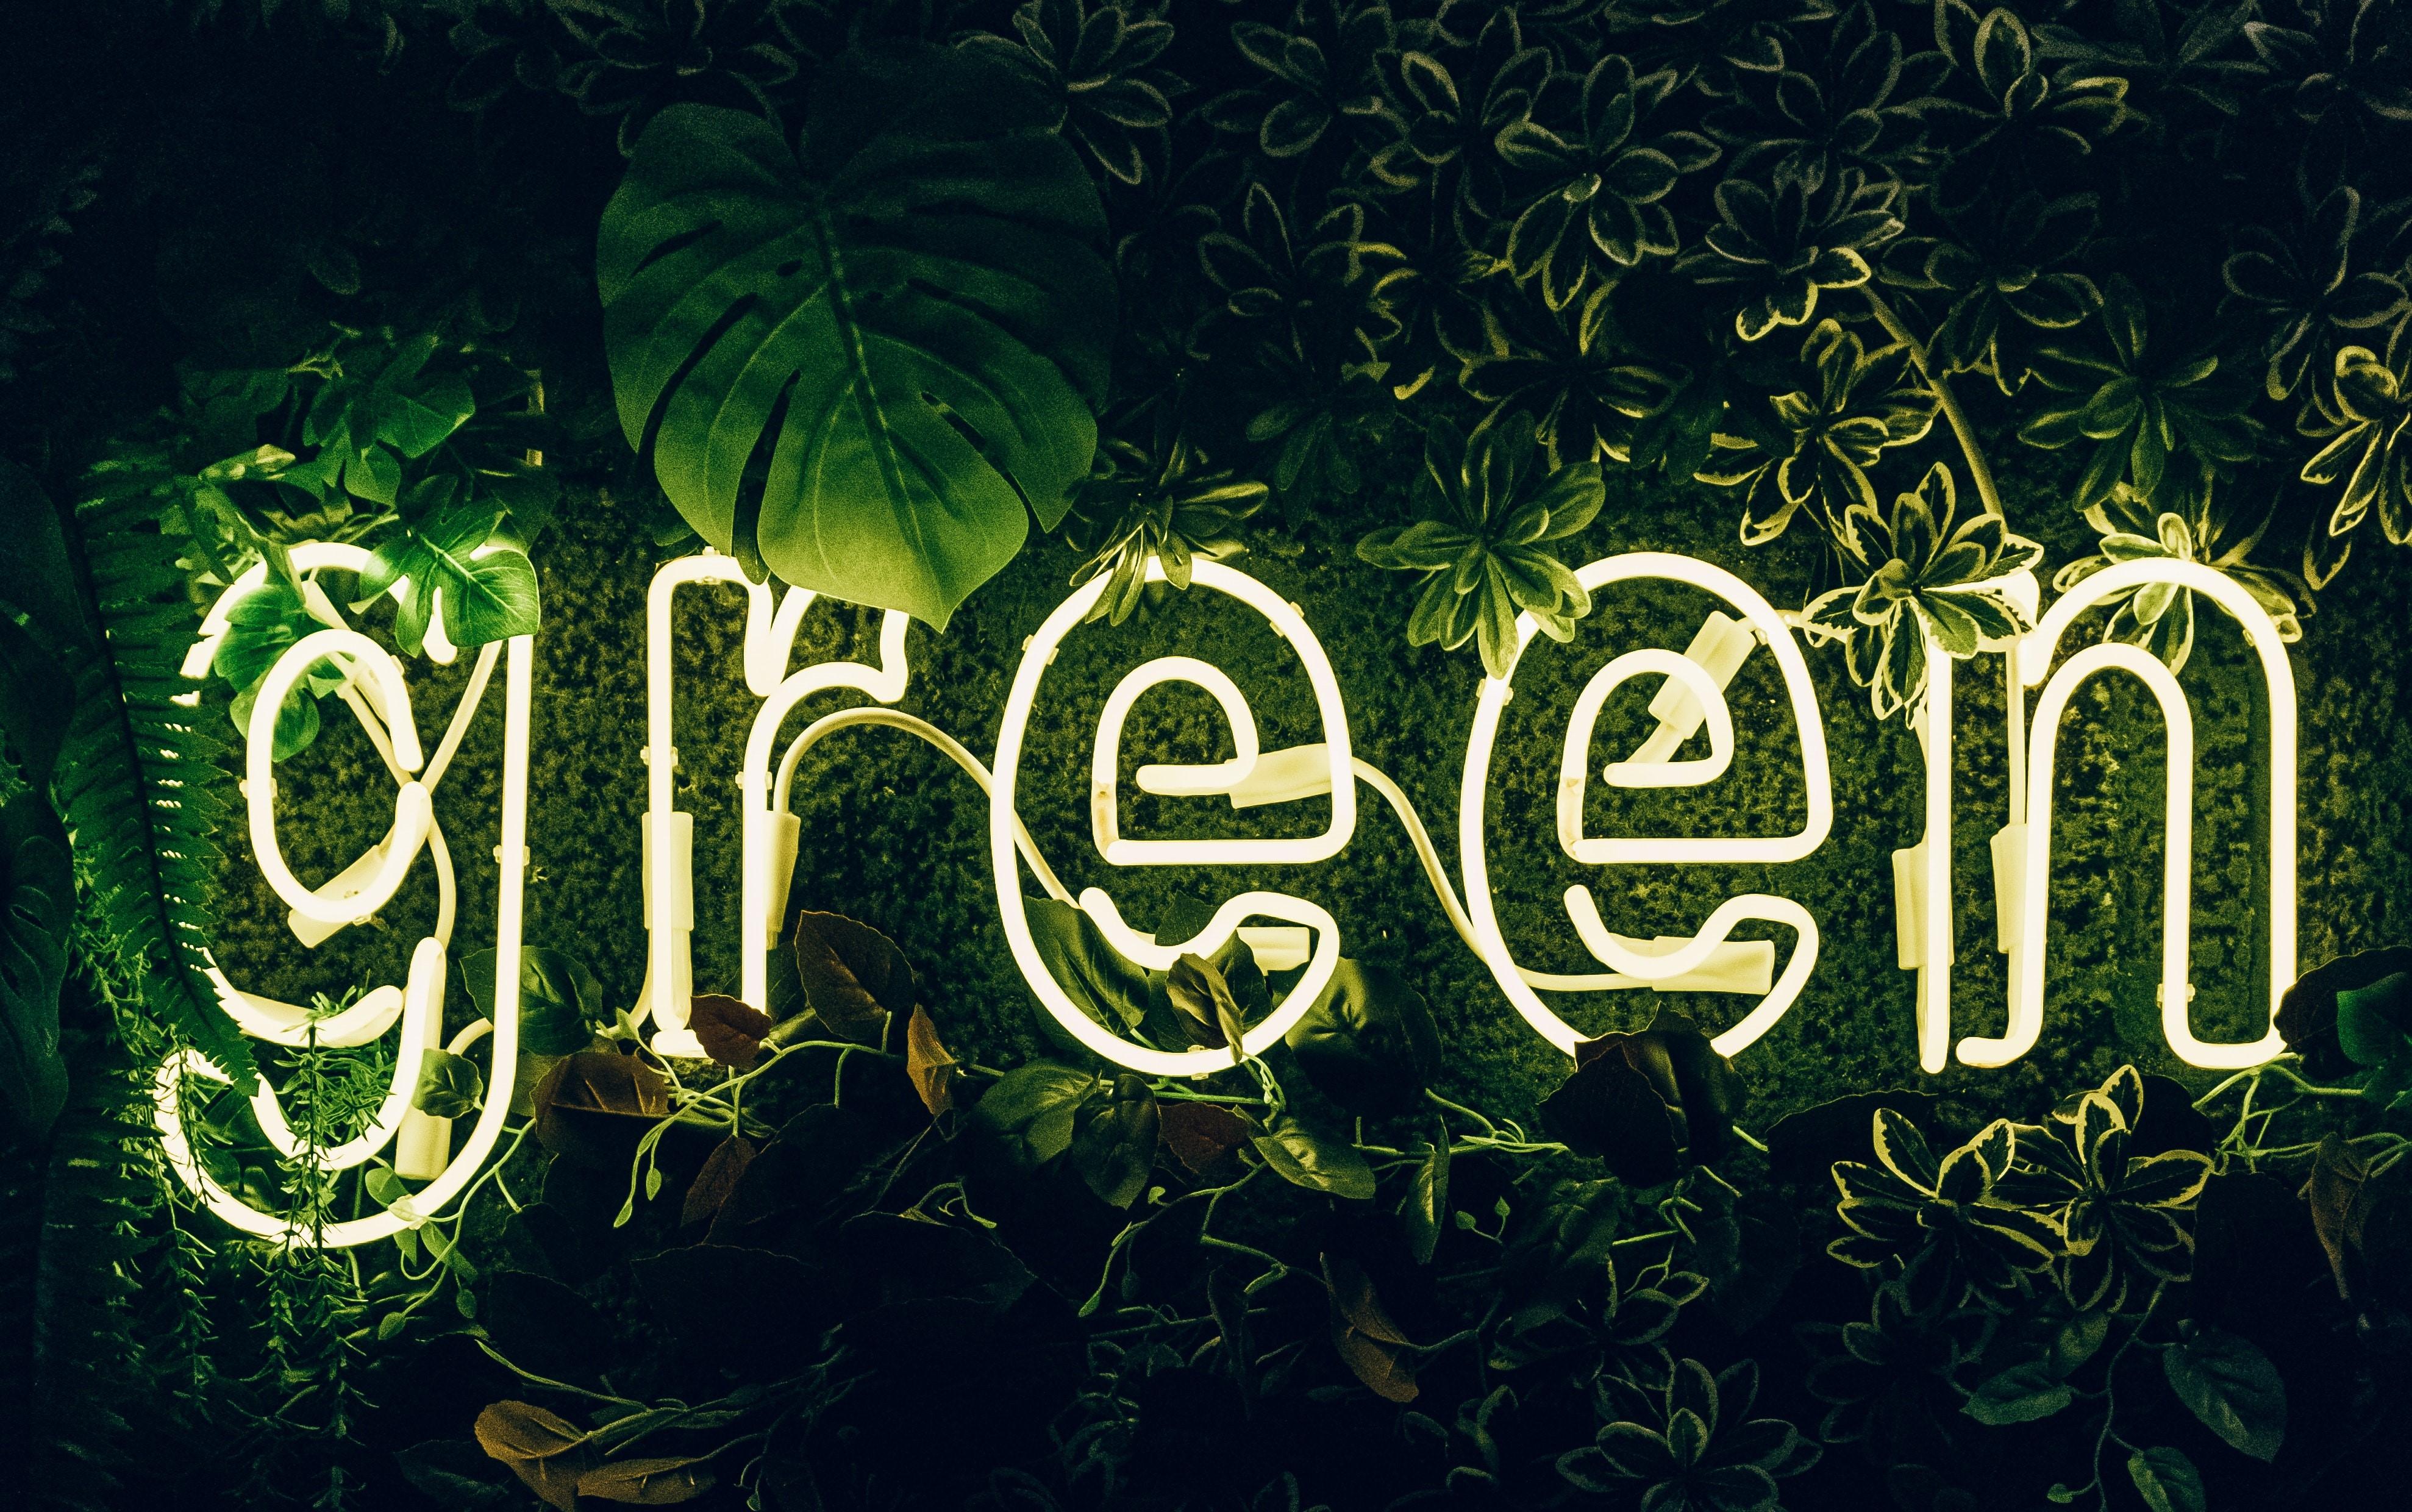 illuminated-green-sign-3626733.jpg